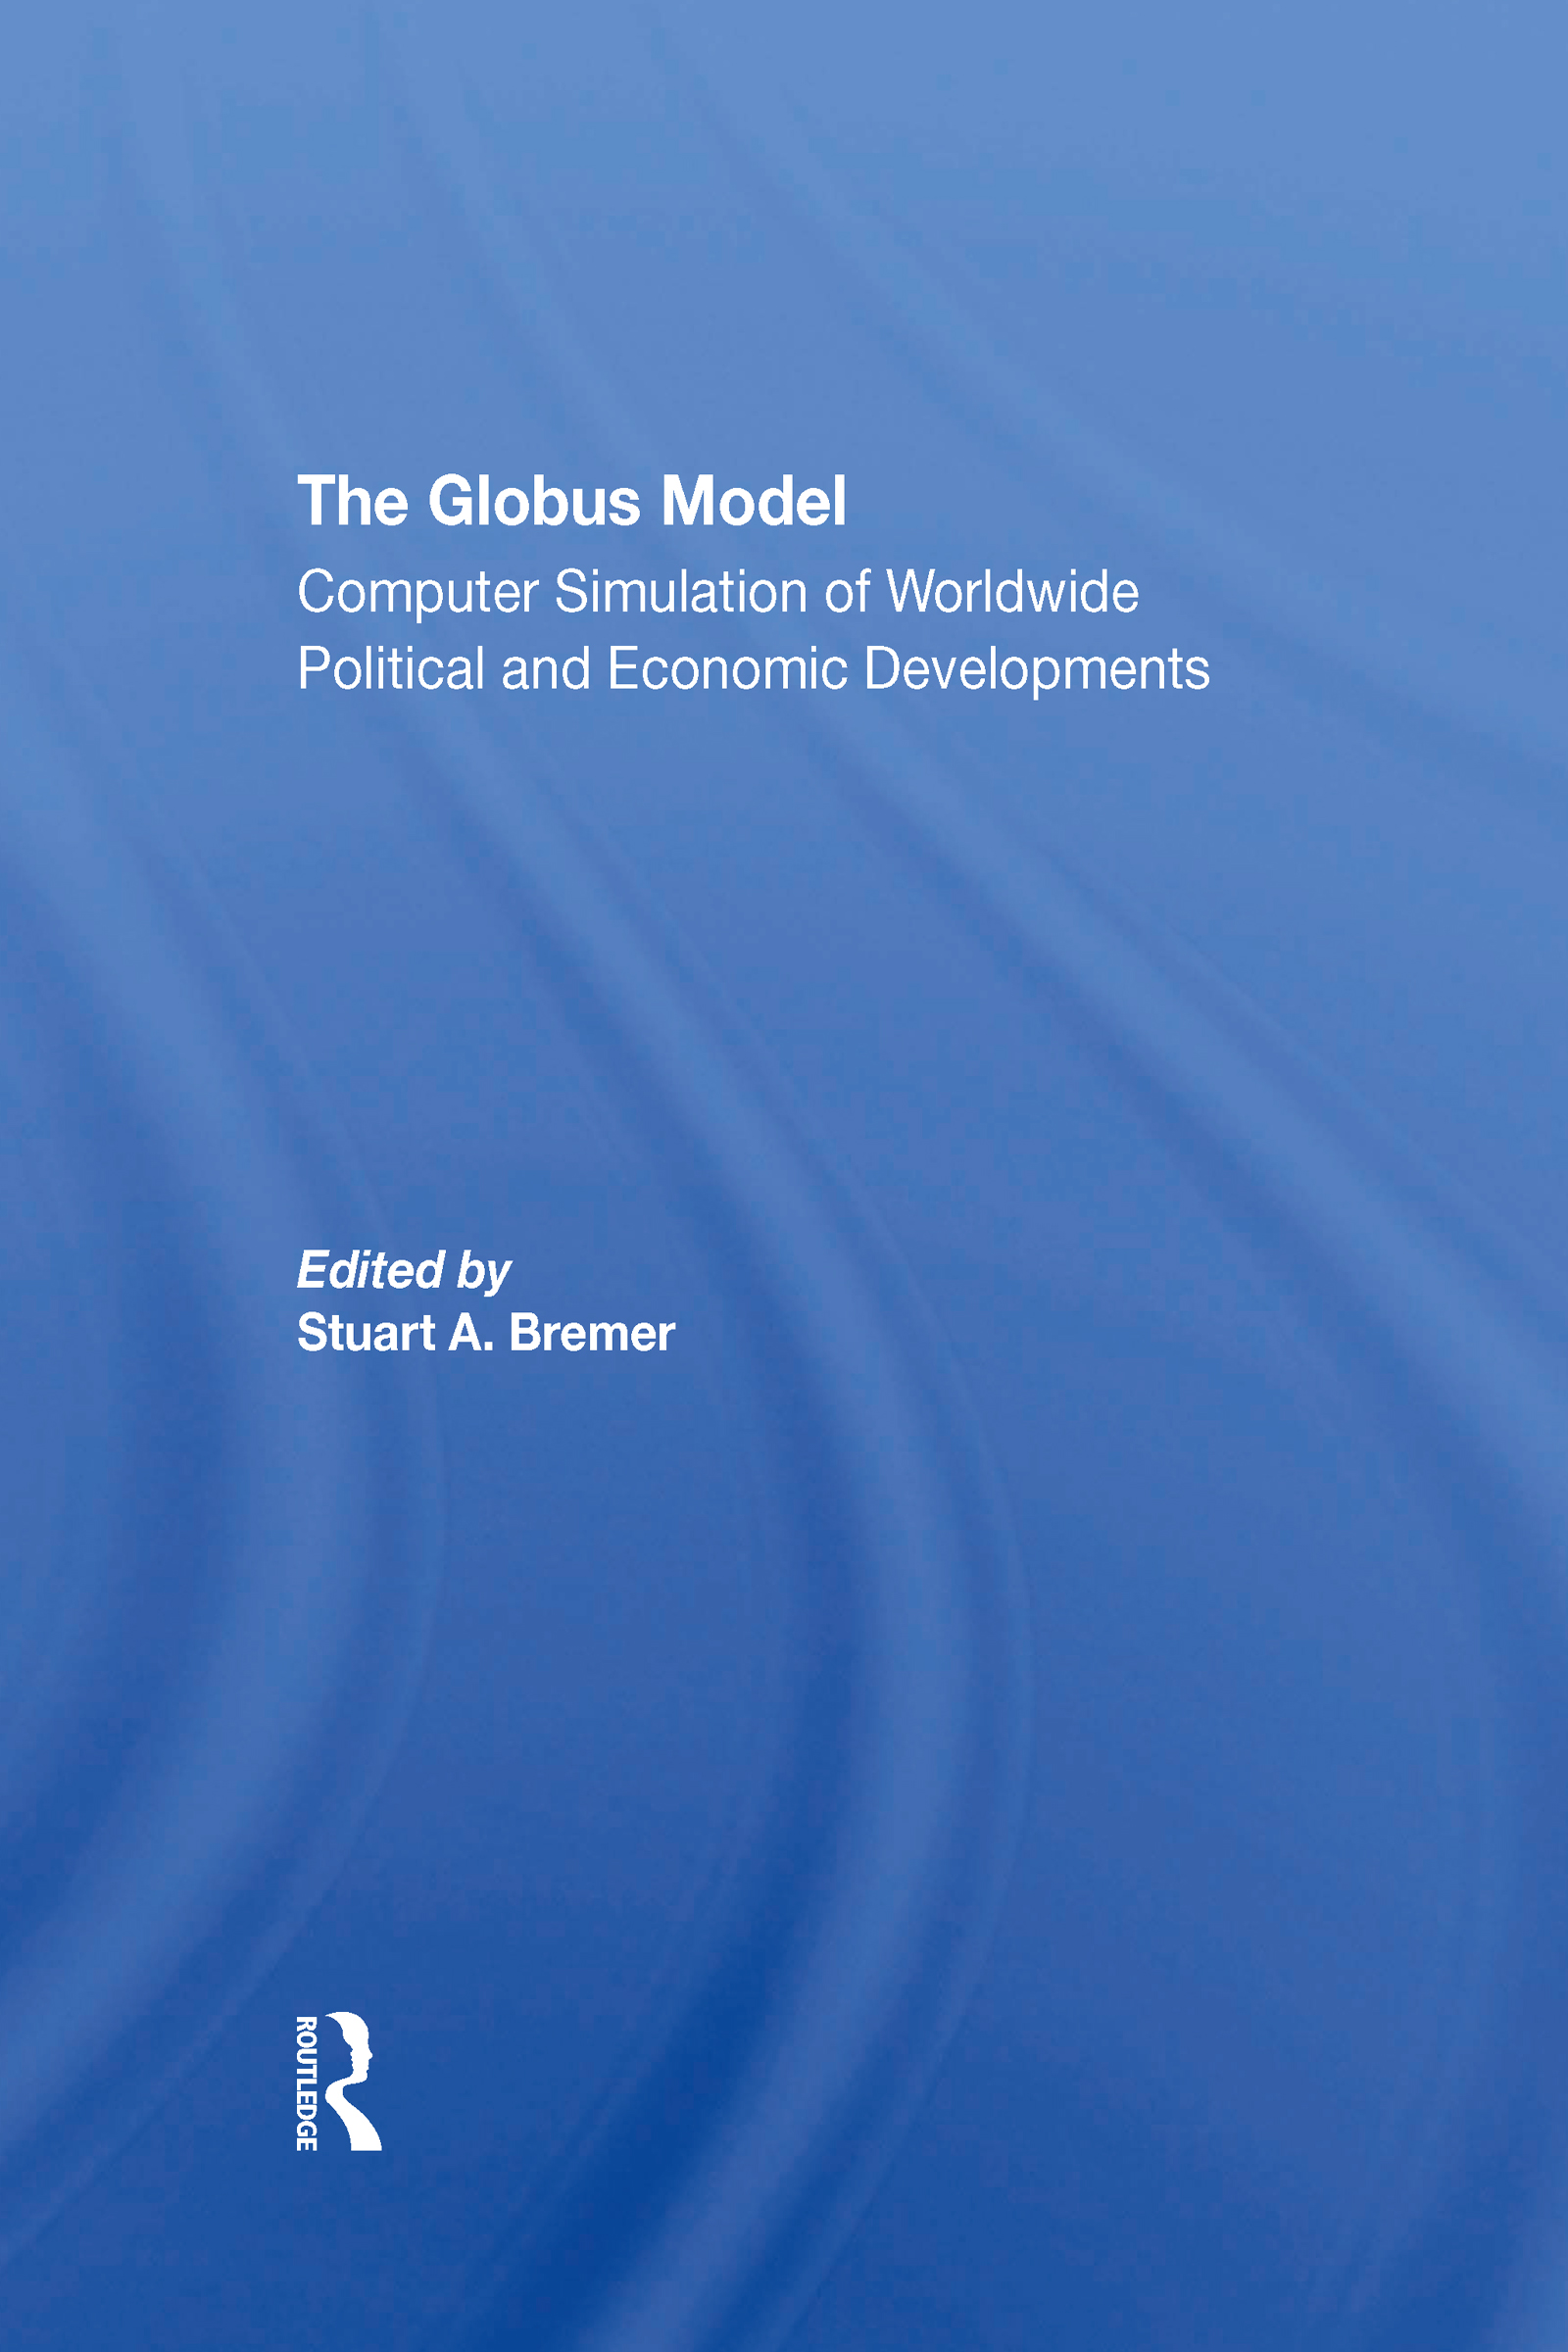 The Globus Model